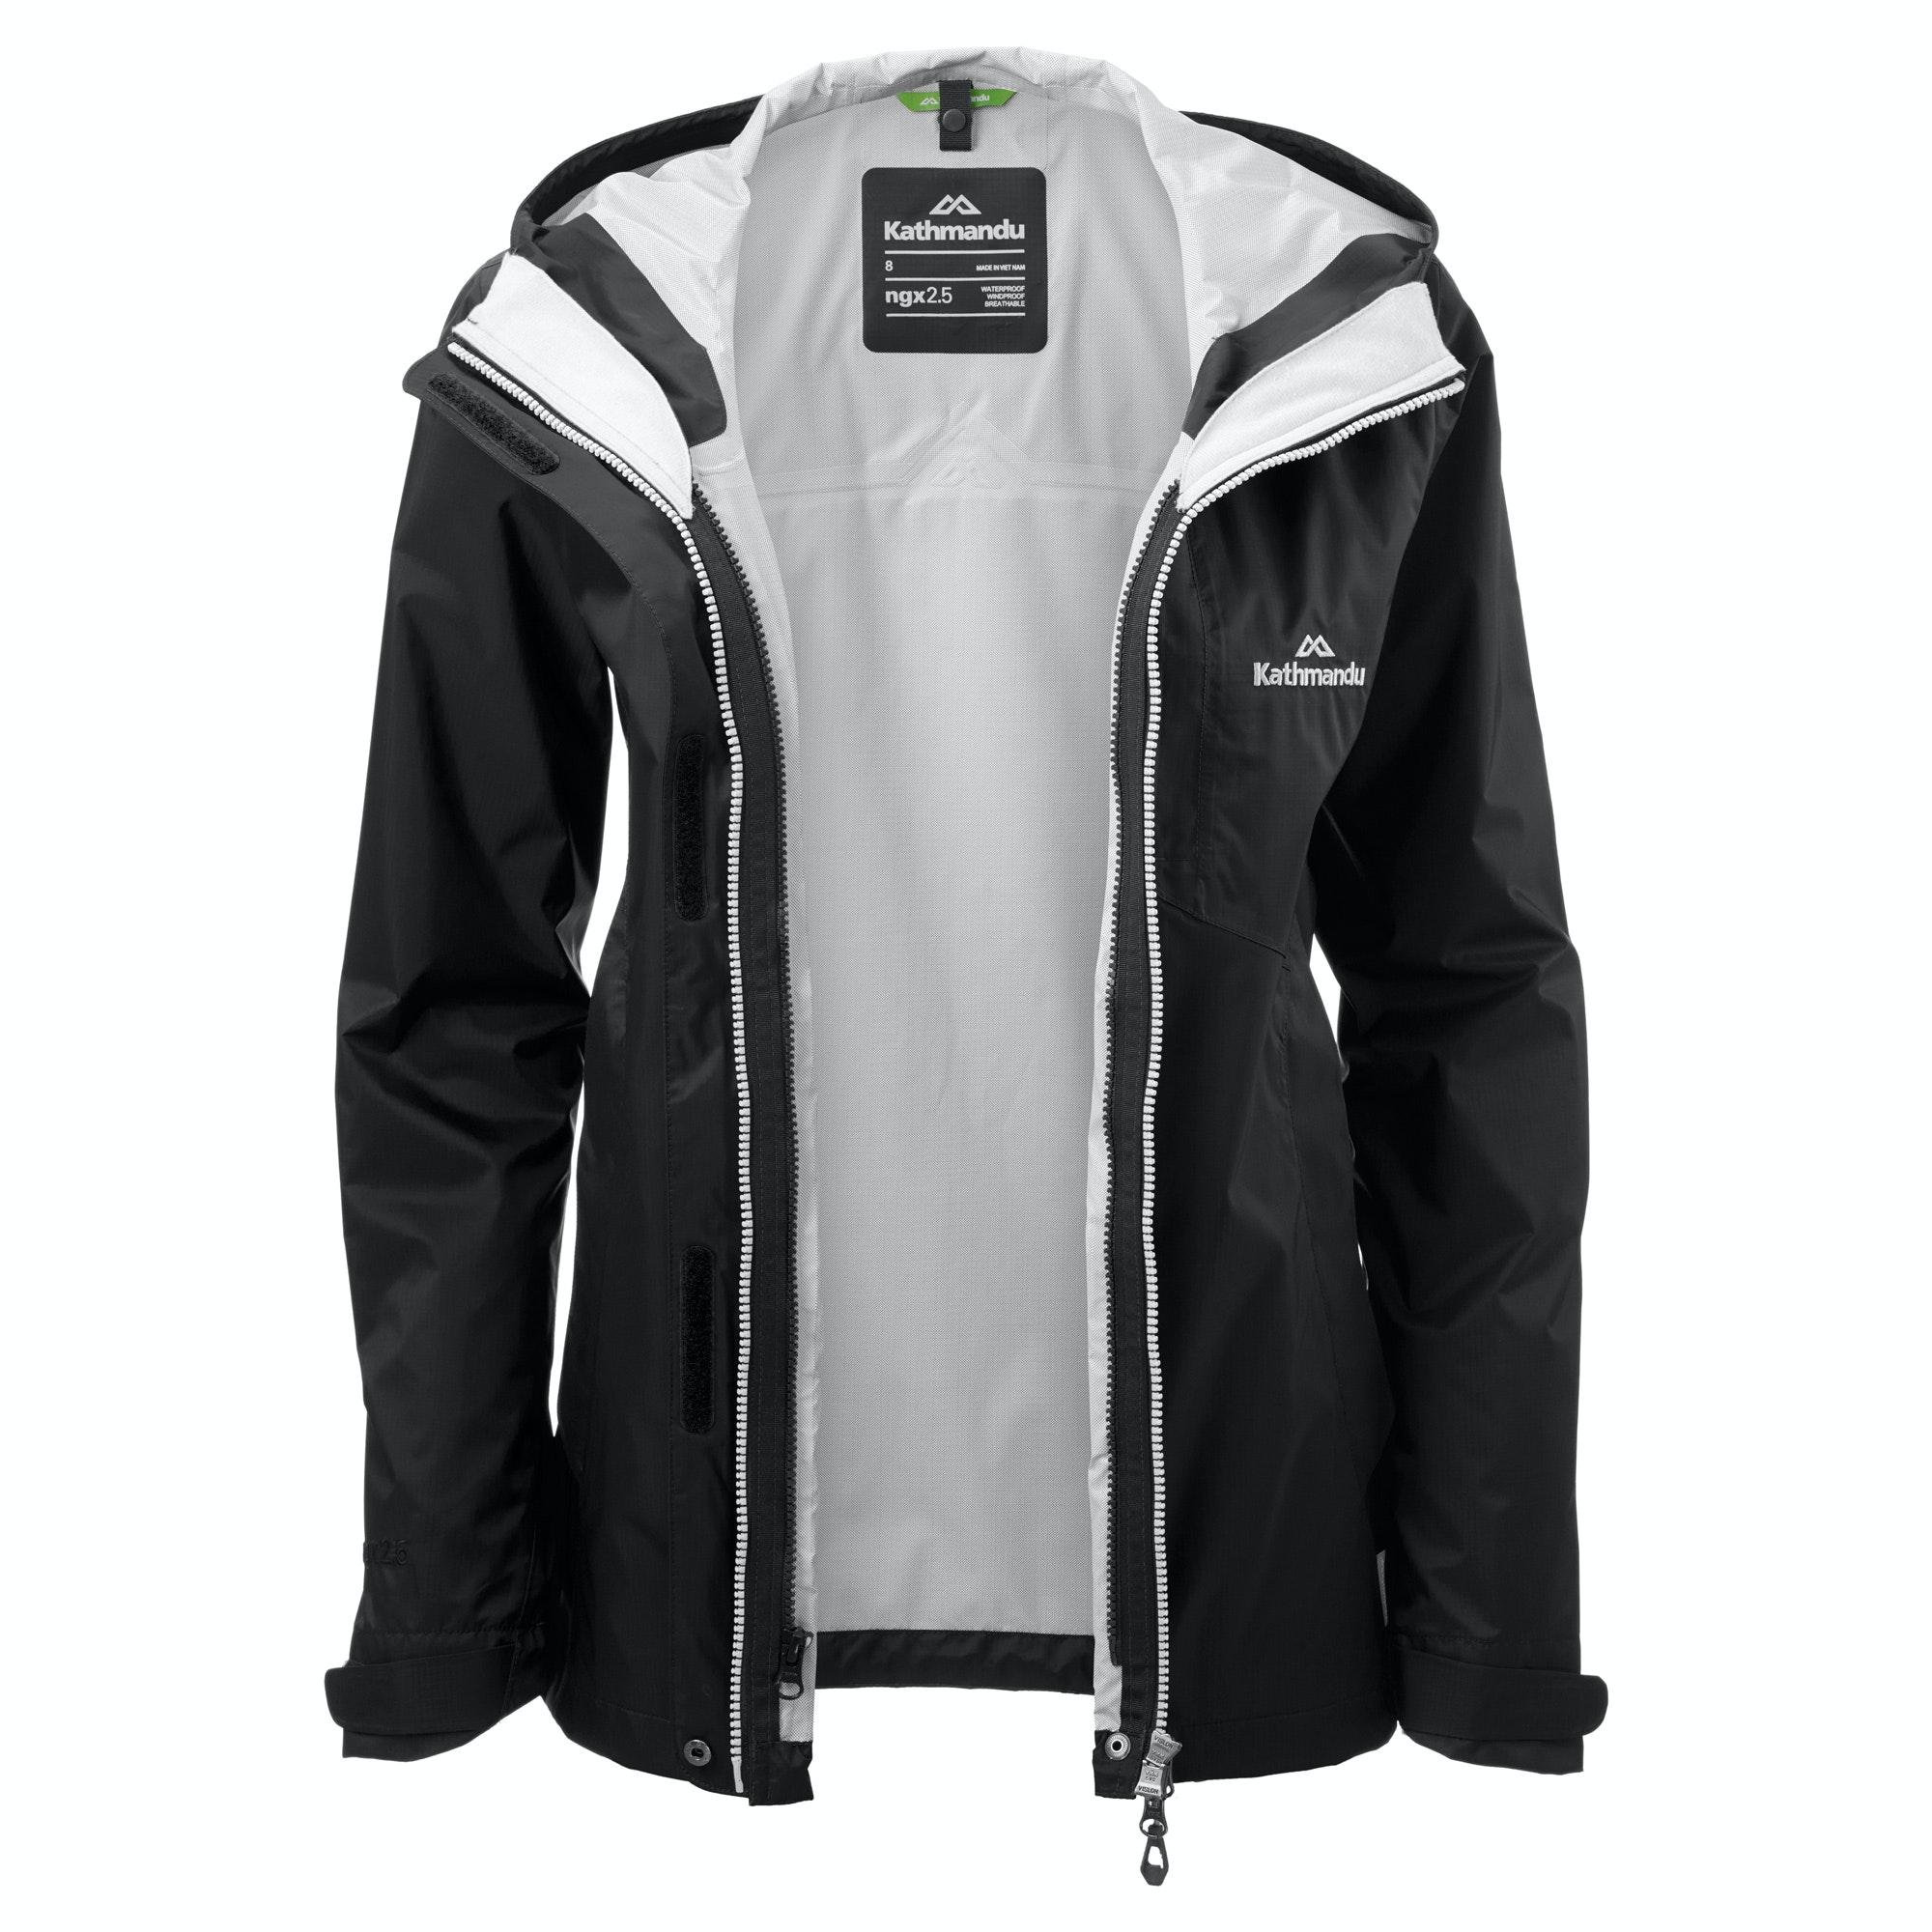 22bc4143e Details about NEW Kathmandu Trailhead Womens Lightweight Hiking Waterproof  Rain Jacket Coat